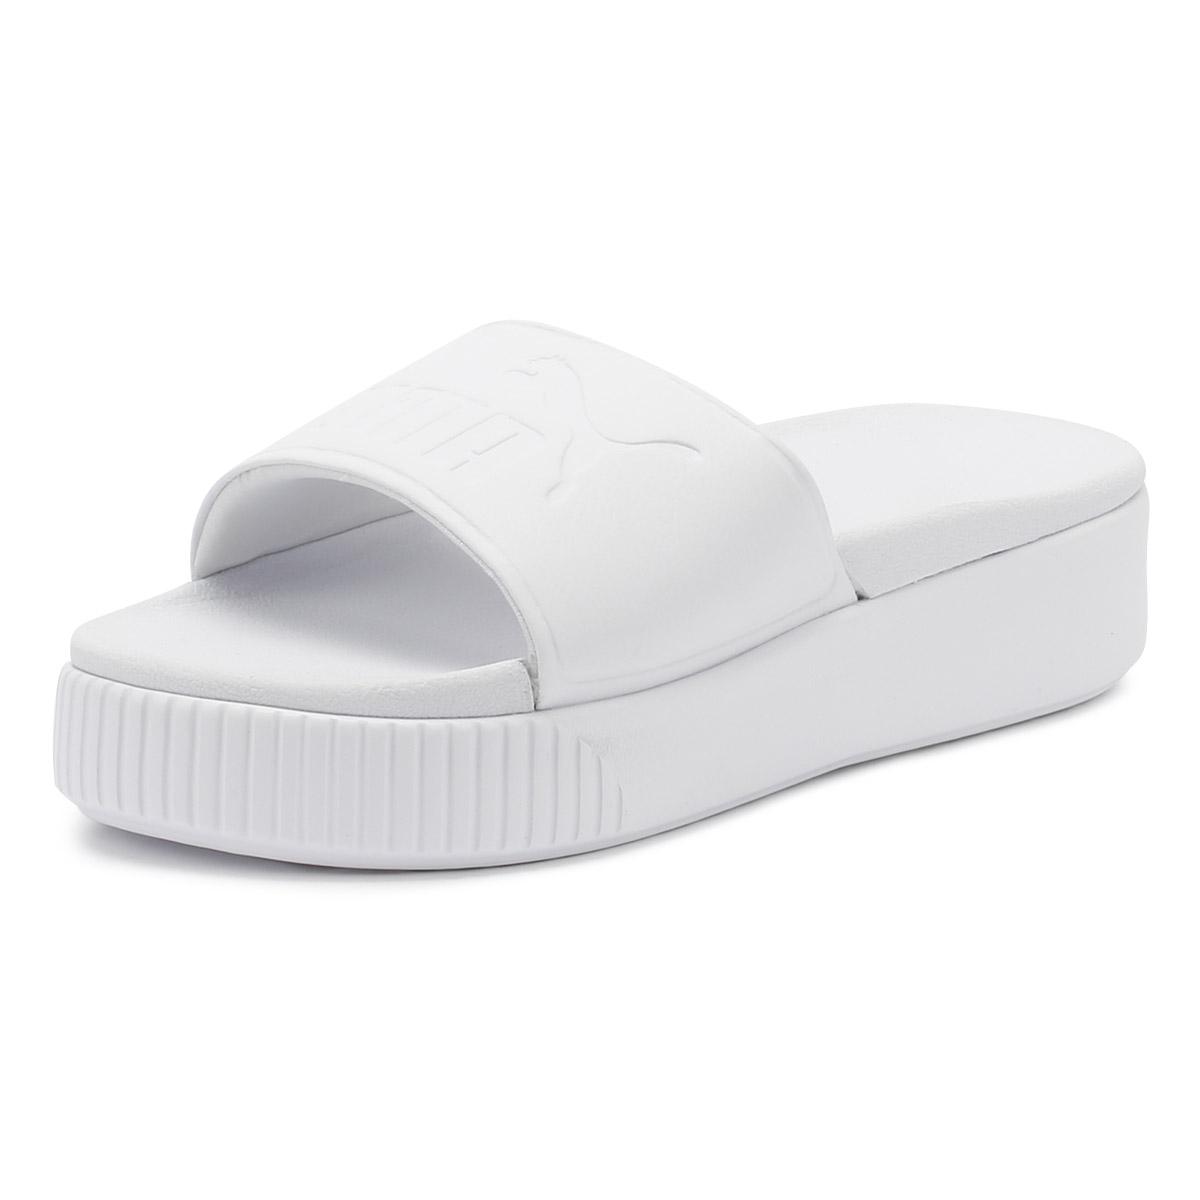 1ef3dd9e5f003e Details about PUMA Womens Platform Slides White Bold Ladies Summer Beach  Casual Sandals